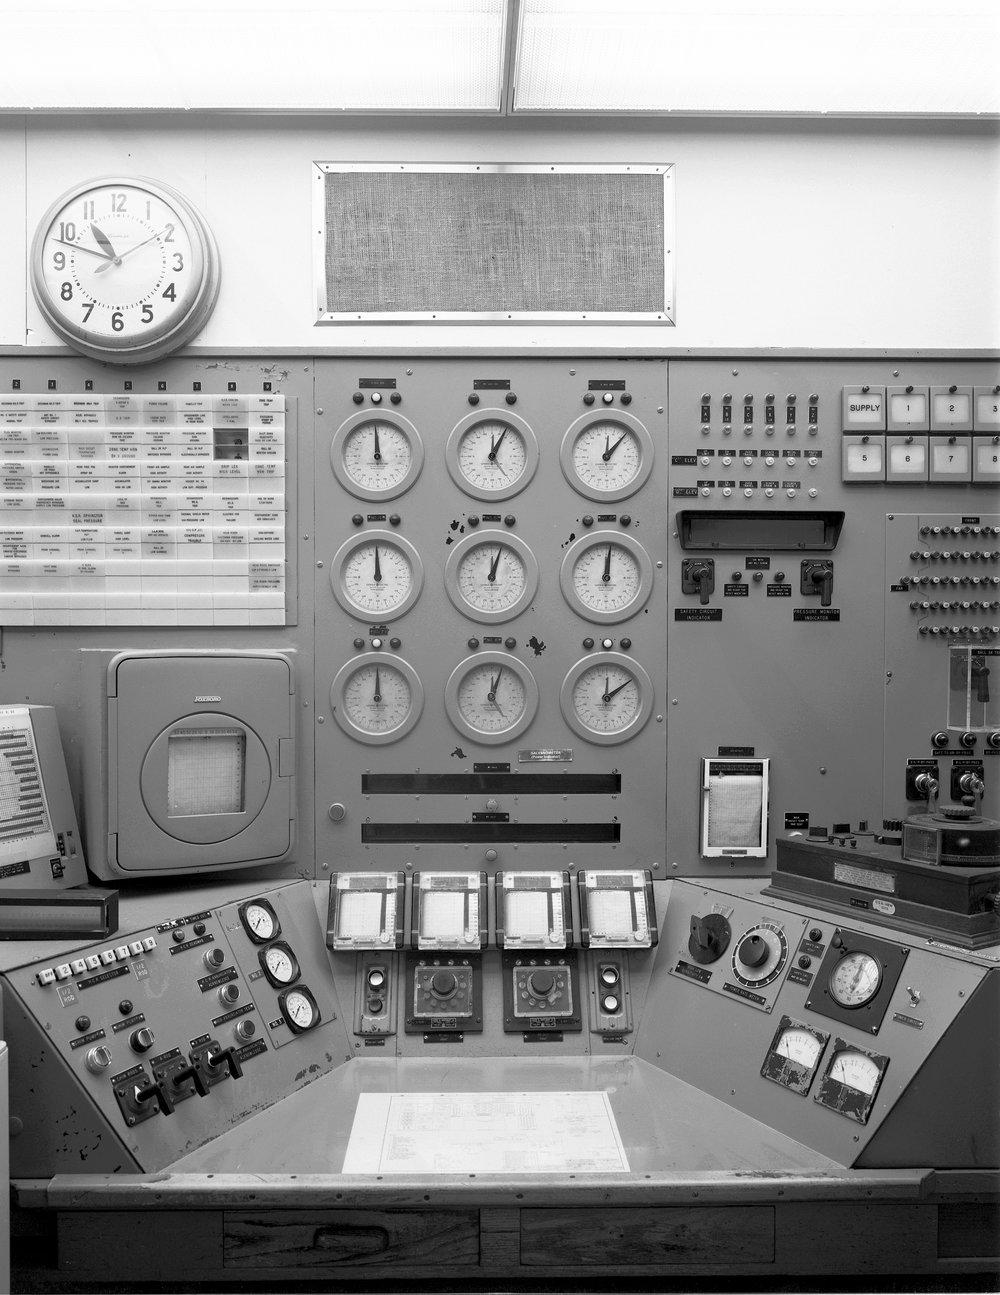 Reactor Operator's Station